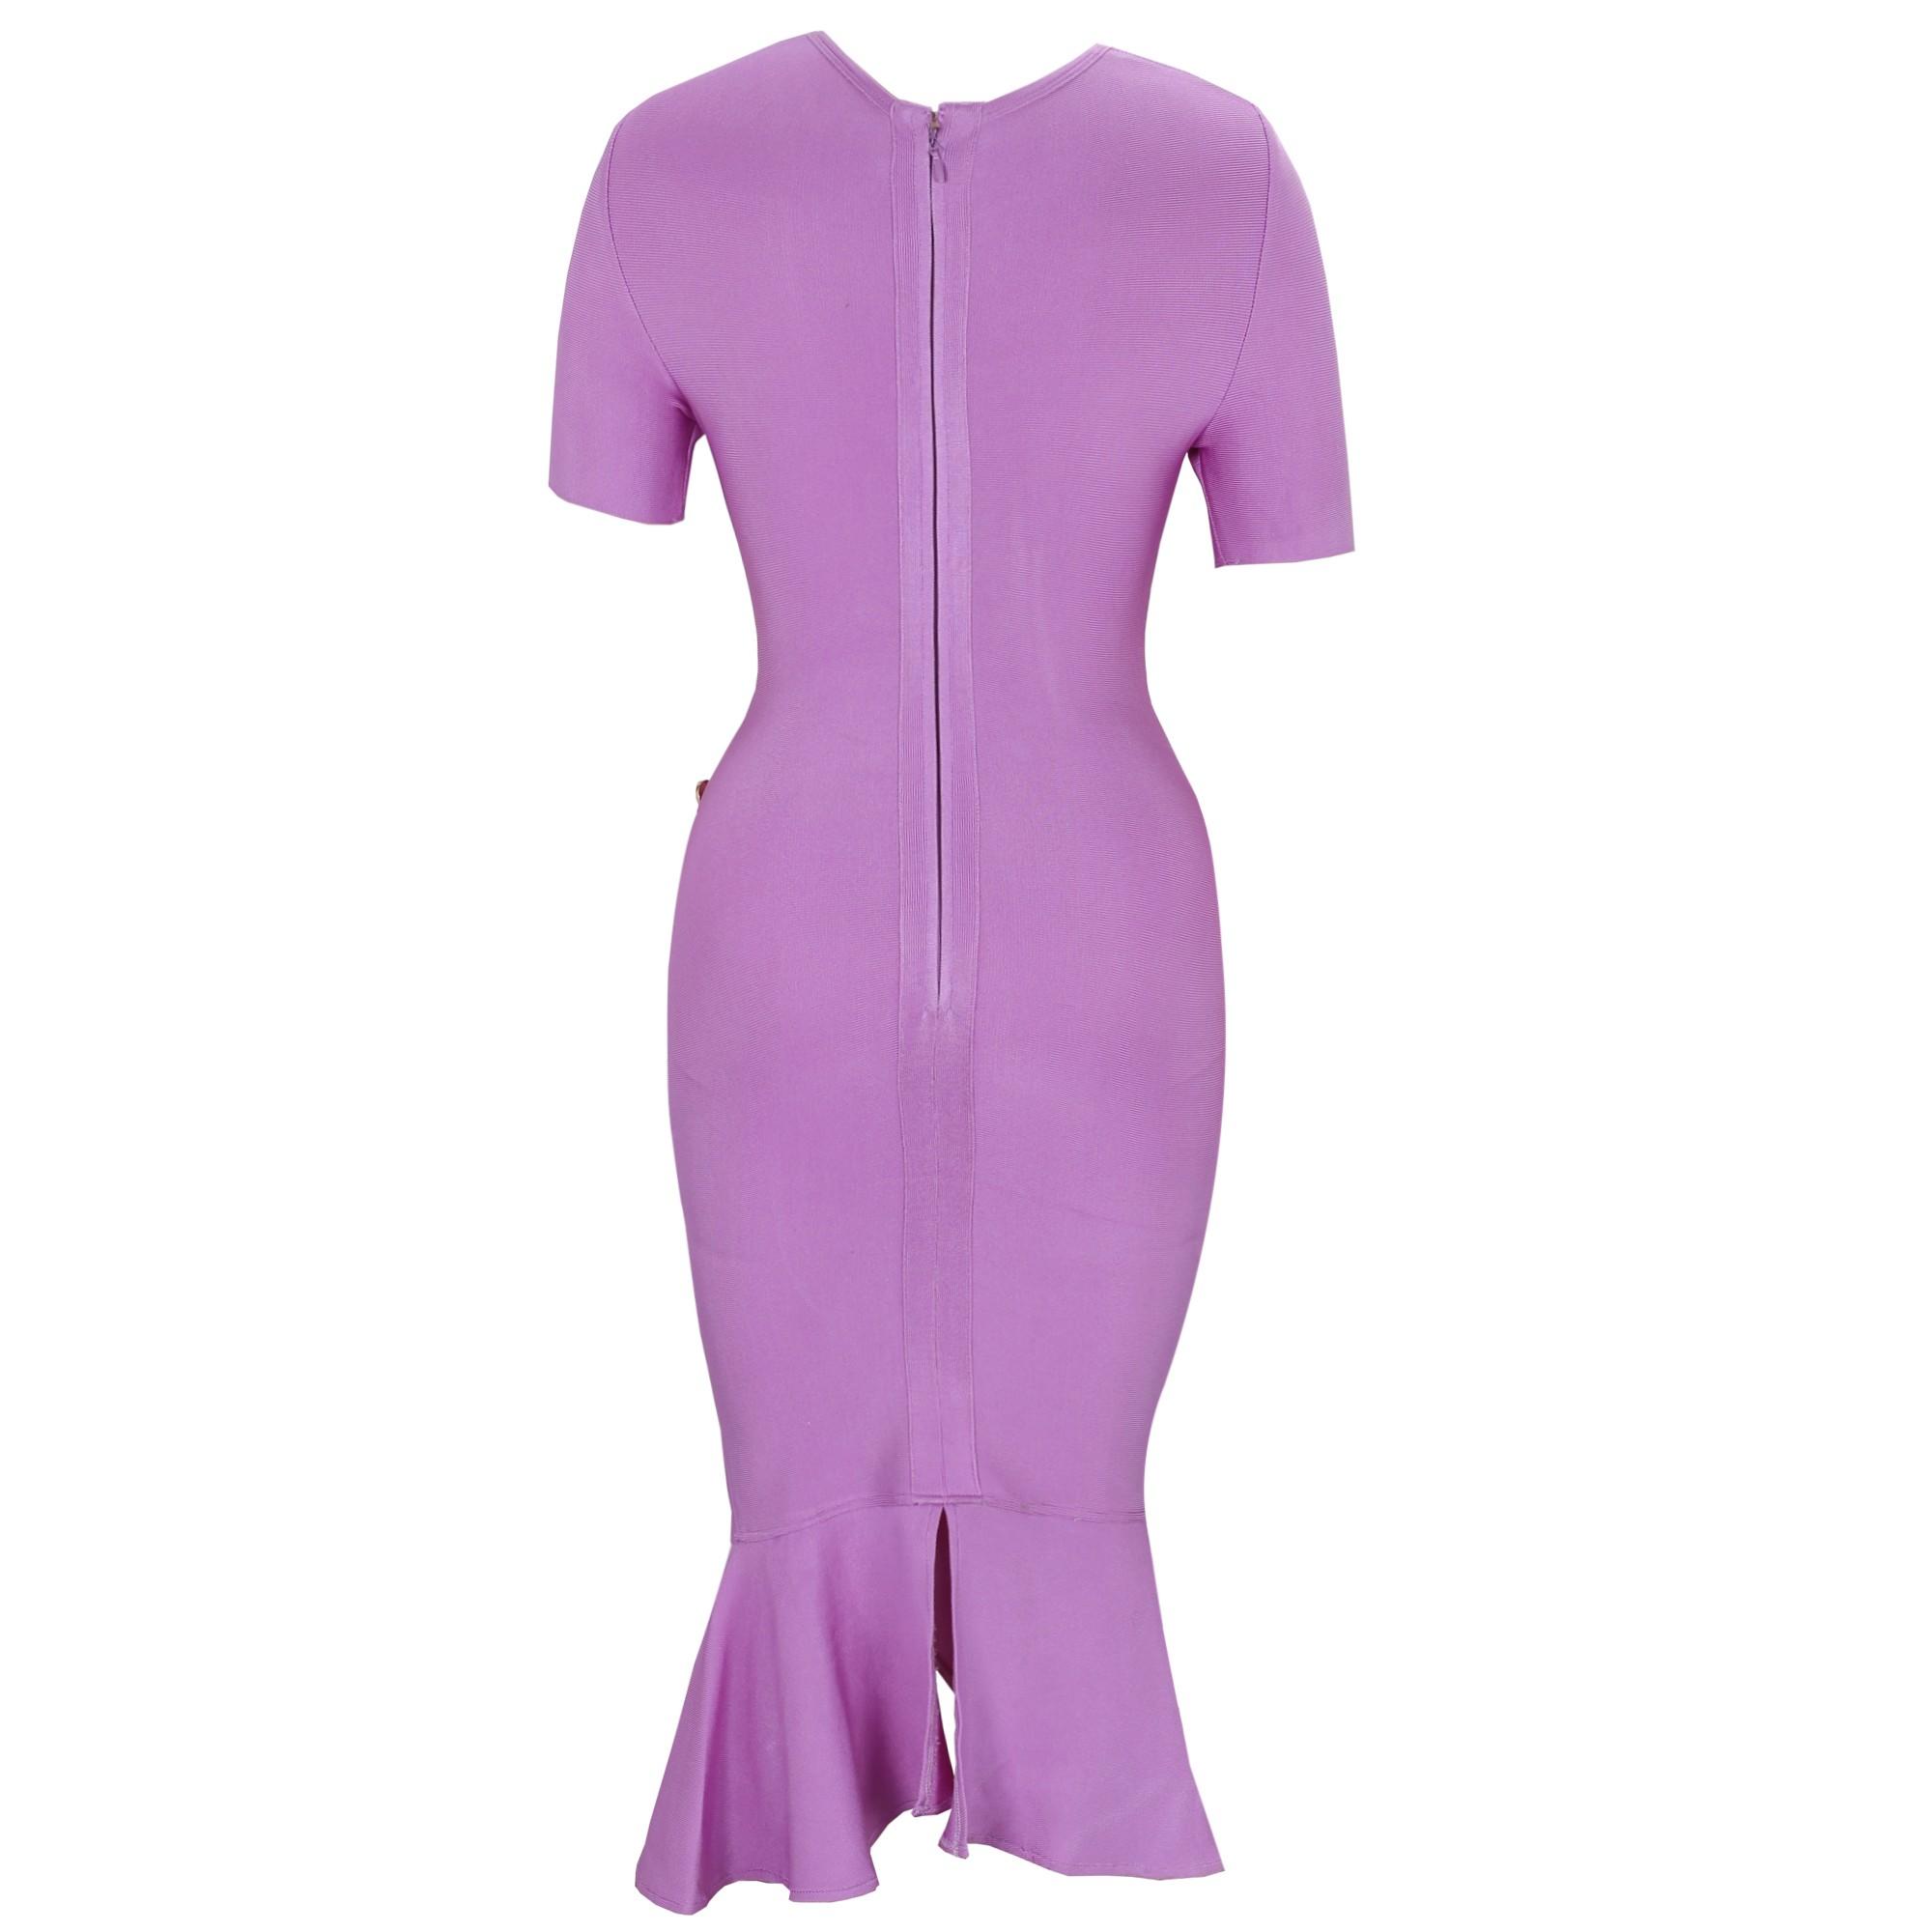 Rayon - Light Purple Round Neck Short Sleeve Over Knee Fishtail Evening Bandage Dress HJ556-Light Purple